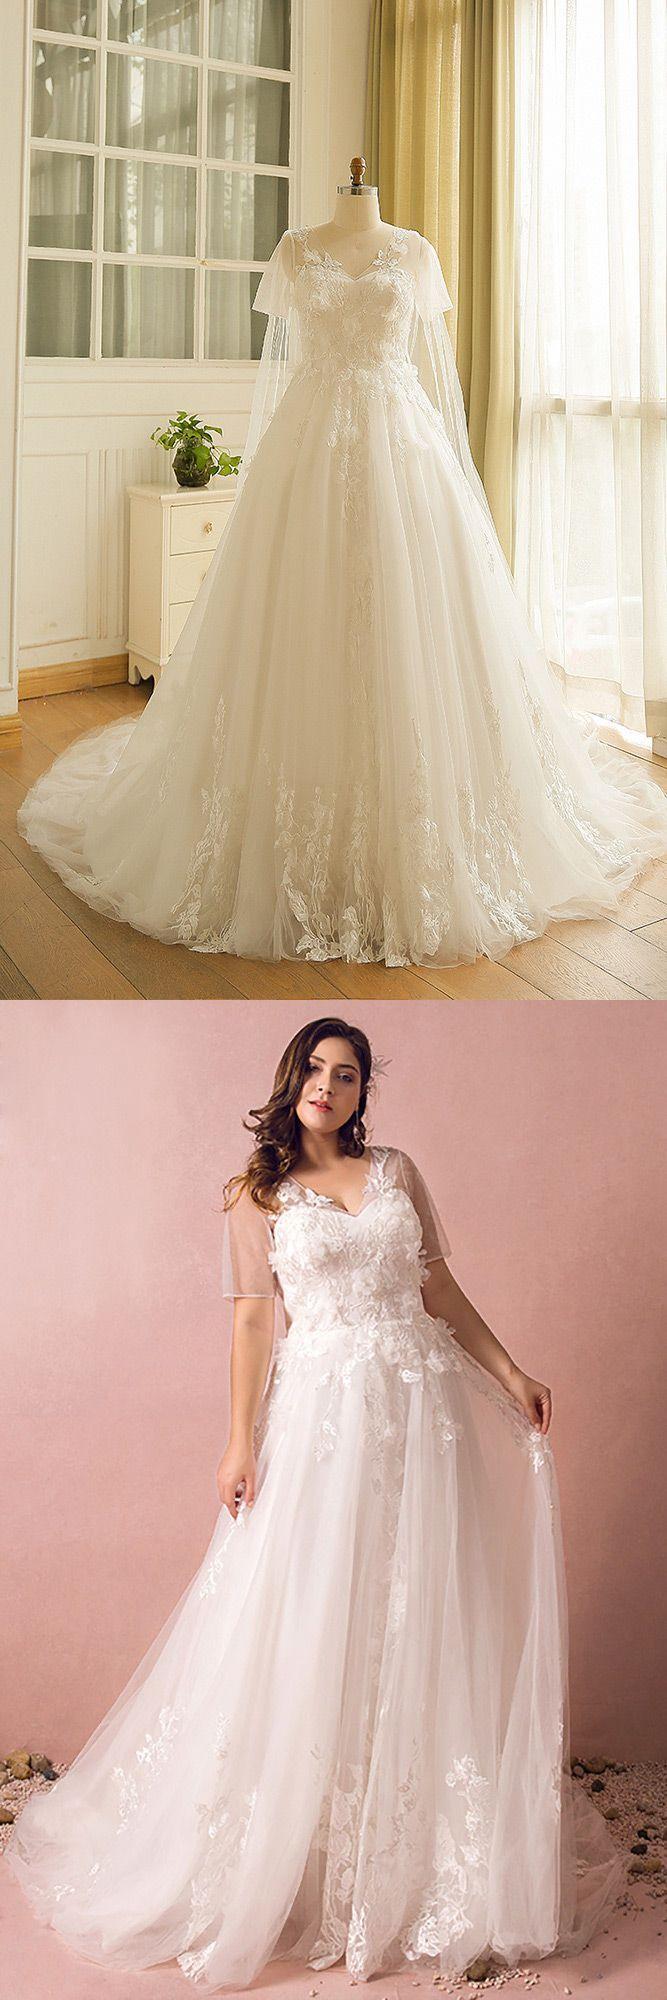 Dreamy boho plus size wedding dress with sleeves for beach wedding